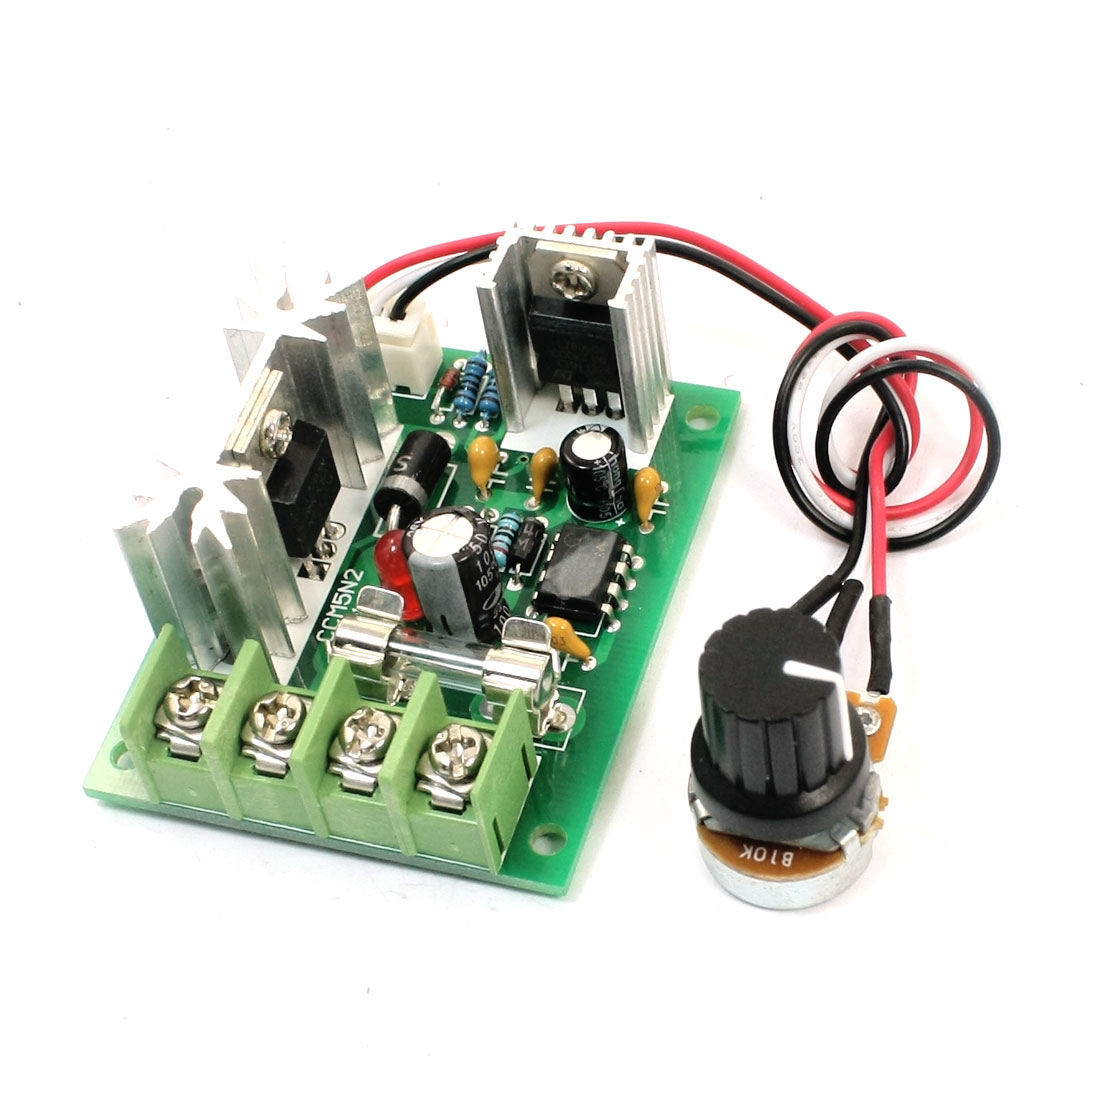 CCM5N2 Pulse Width Modulation PWM DC Speed Controller DC6-30V